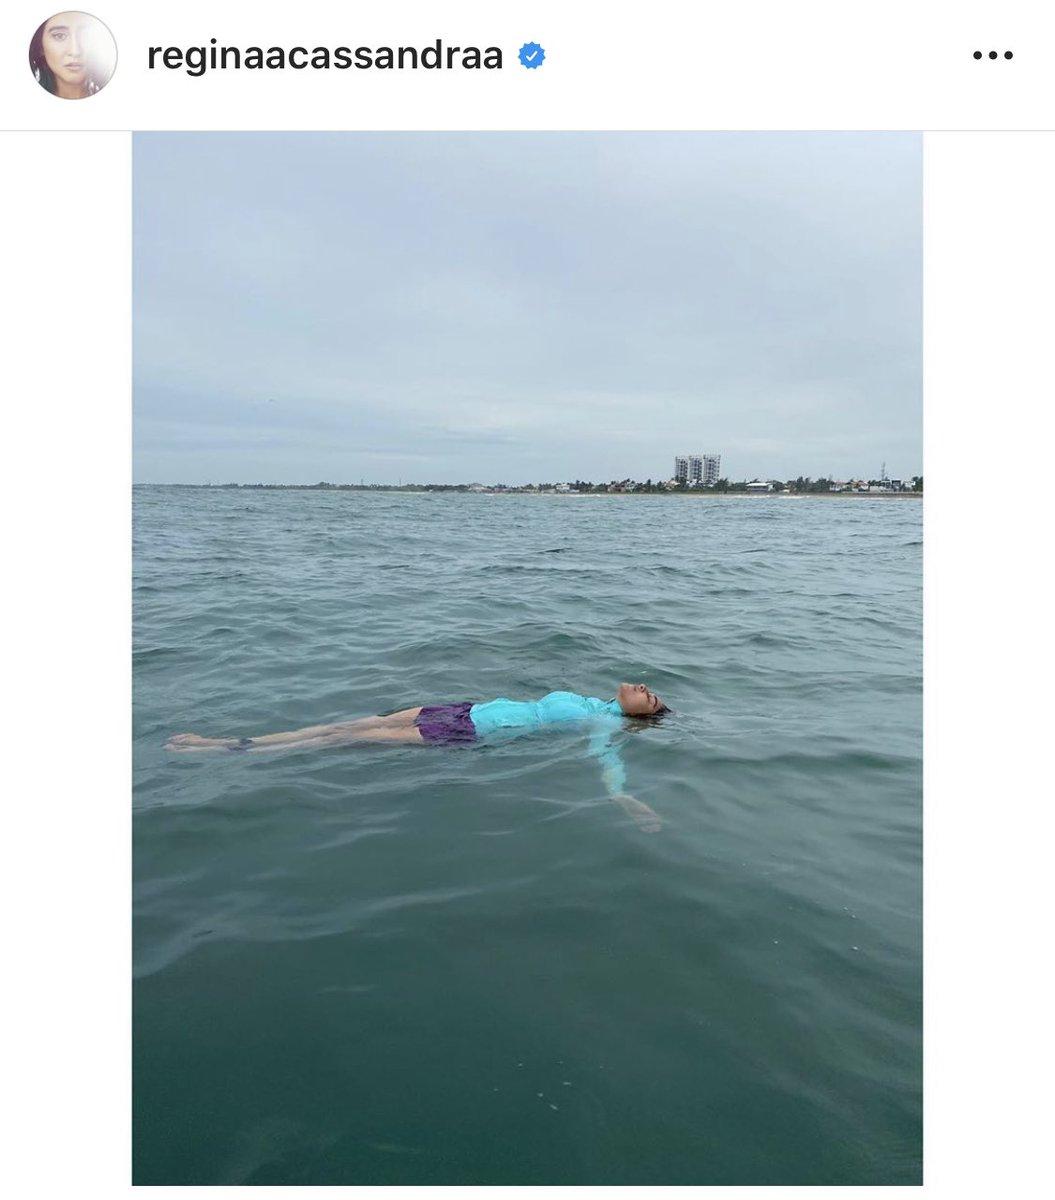 The coolest surfer in town during lockdown @ReginaCassandra https://t.co/TsljAdcGFB